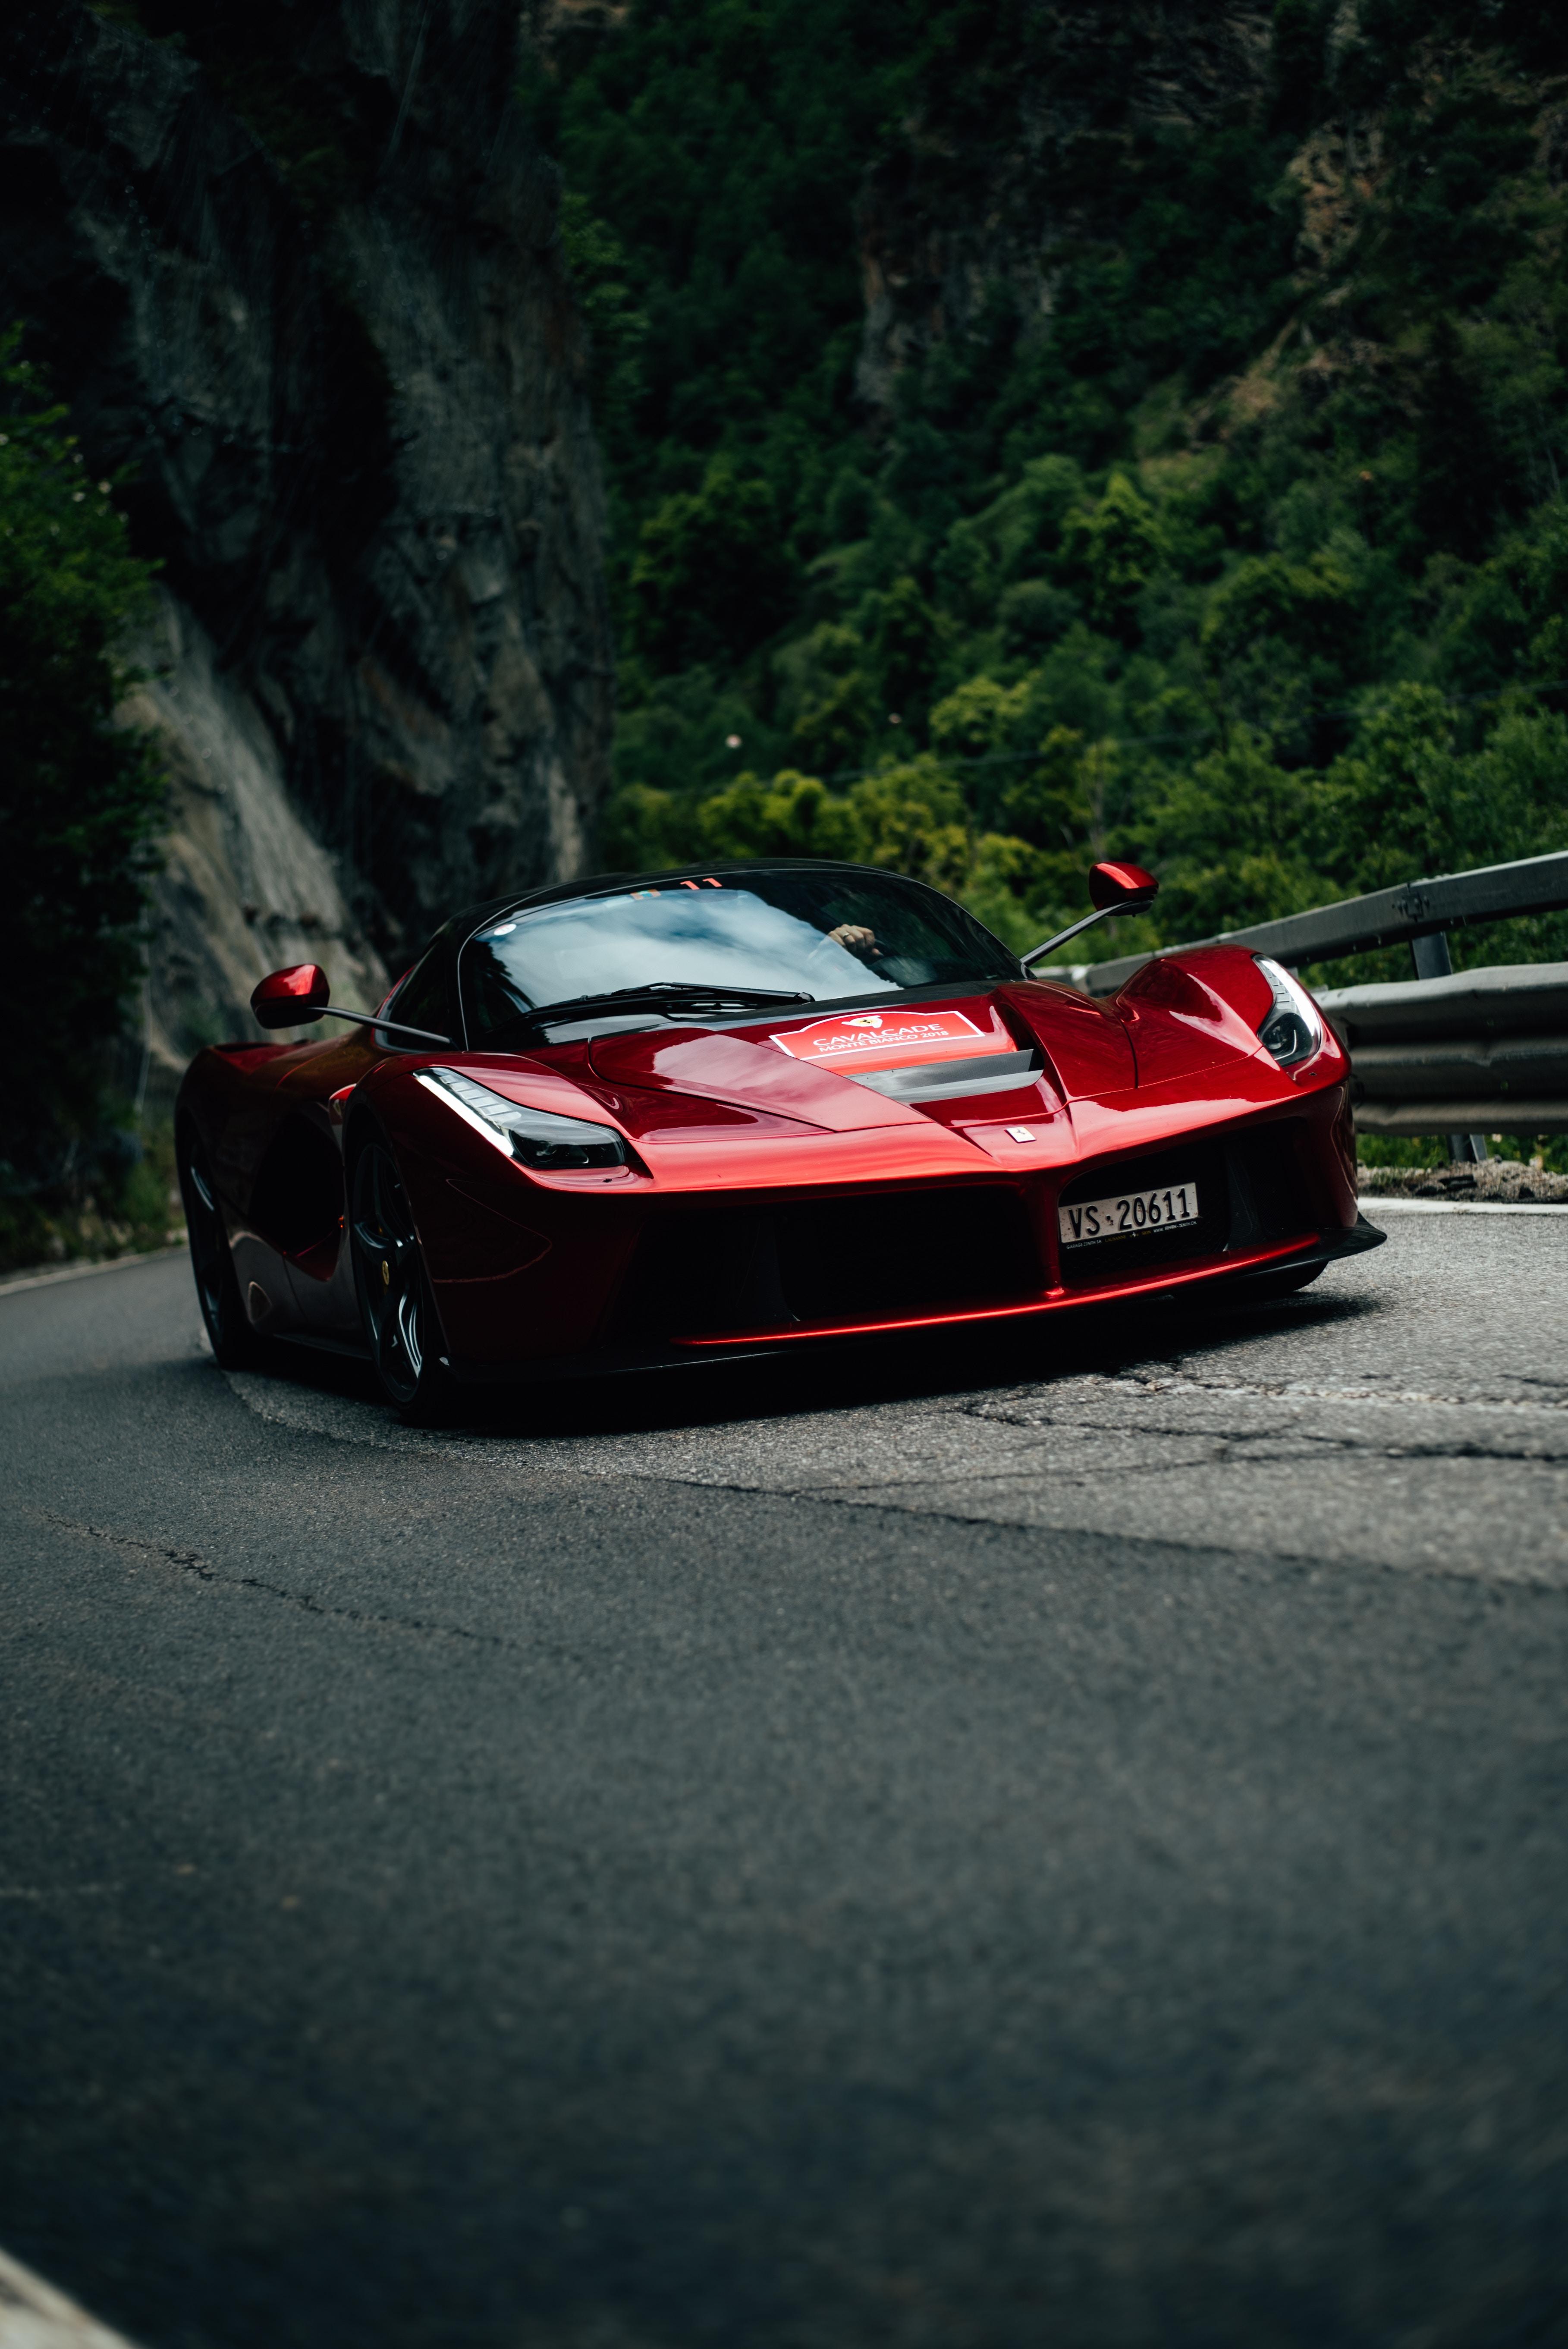 82913 download wallpaper Cars, Laferrari, Ferrari F70, Sports Car, Sports, Traffic, Movement screensavers and pictures for free